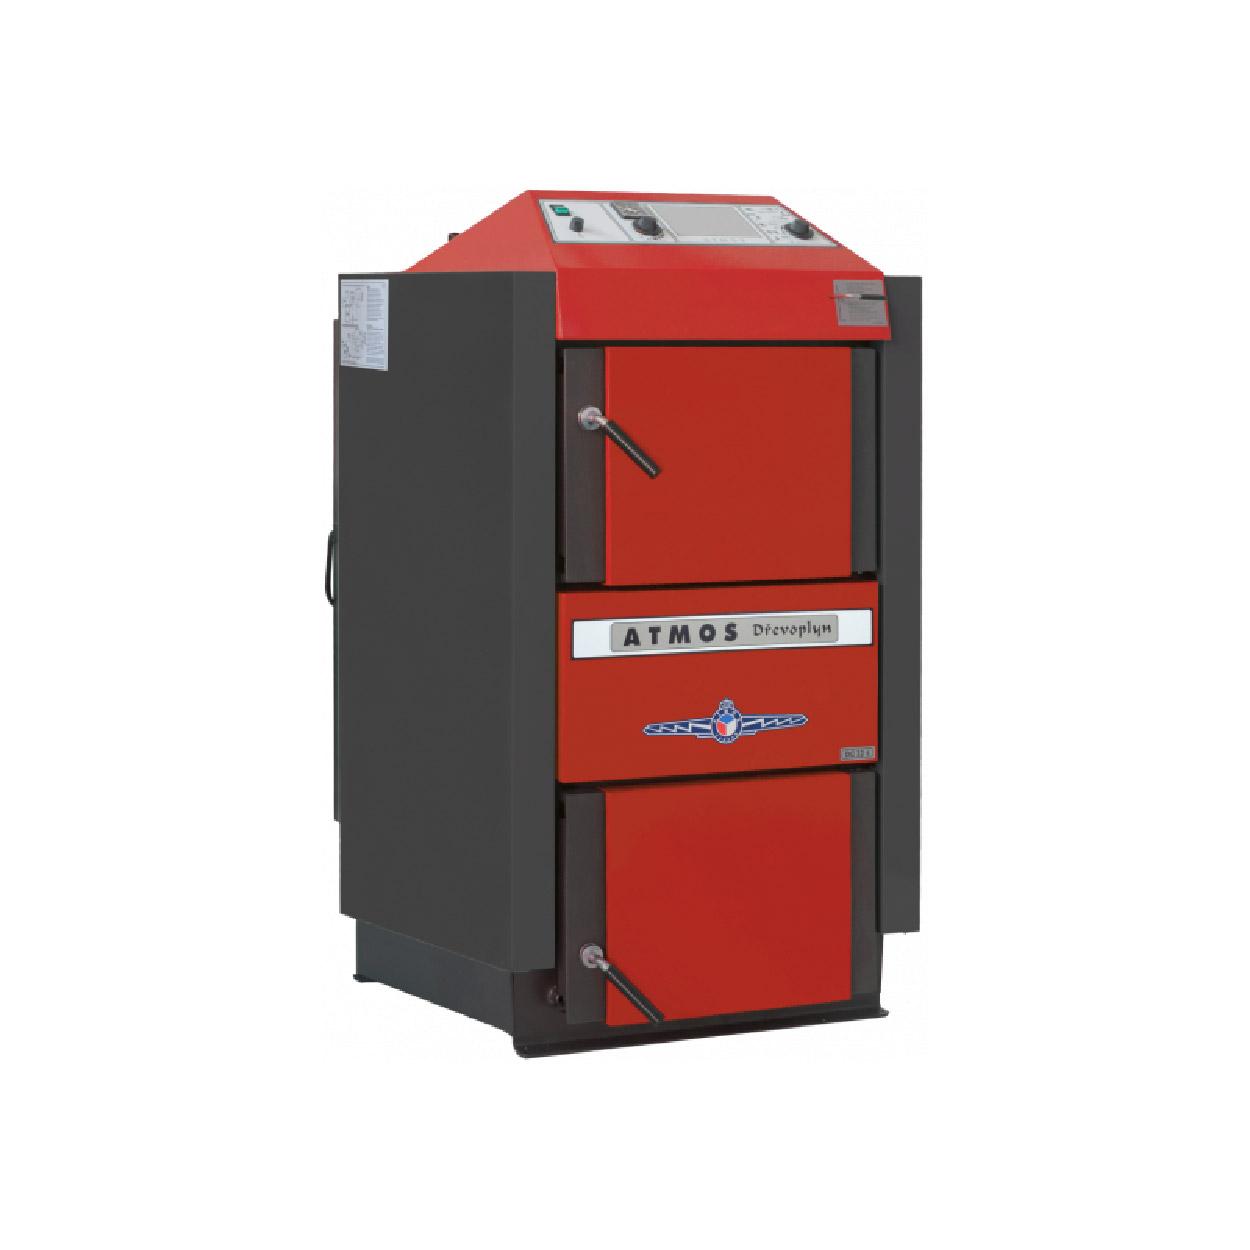 Centrala termica pe lemne ATMOS DC50S 49 kw fornello imagine